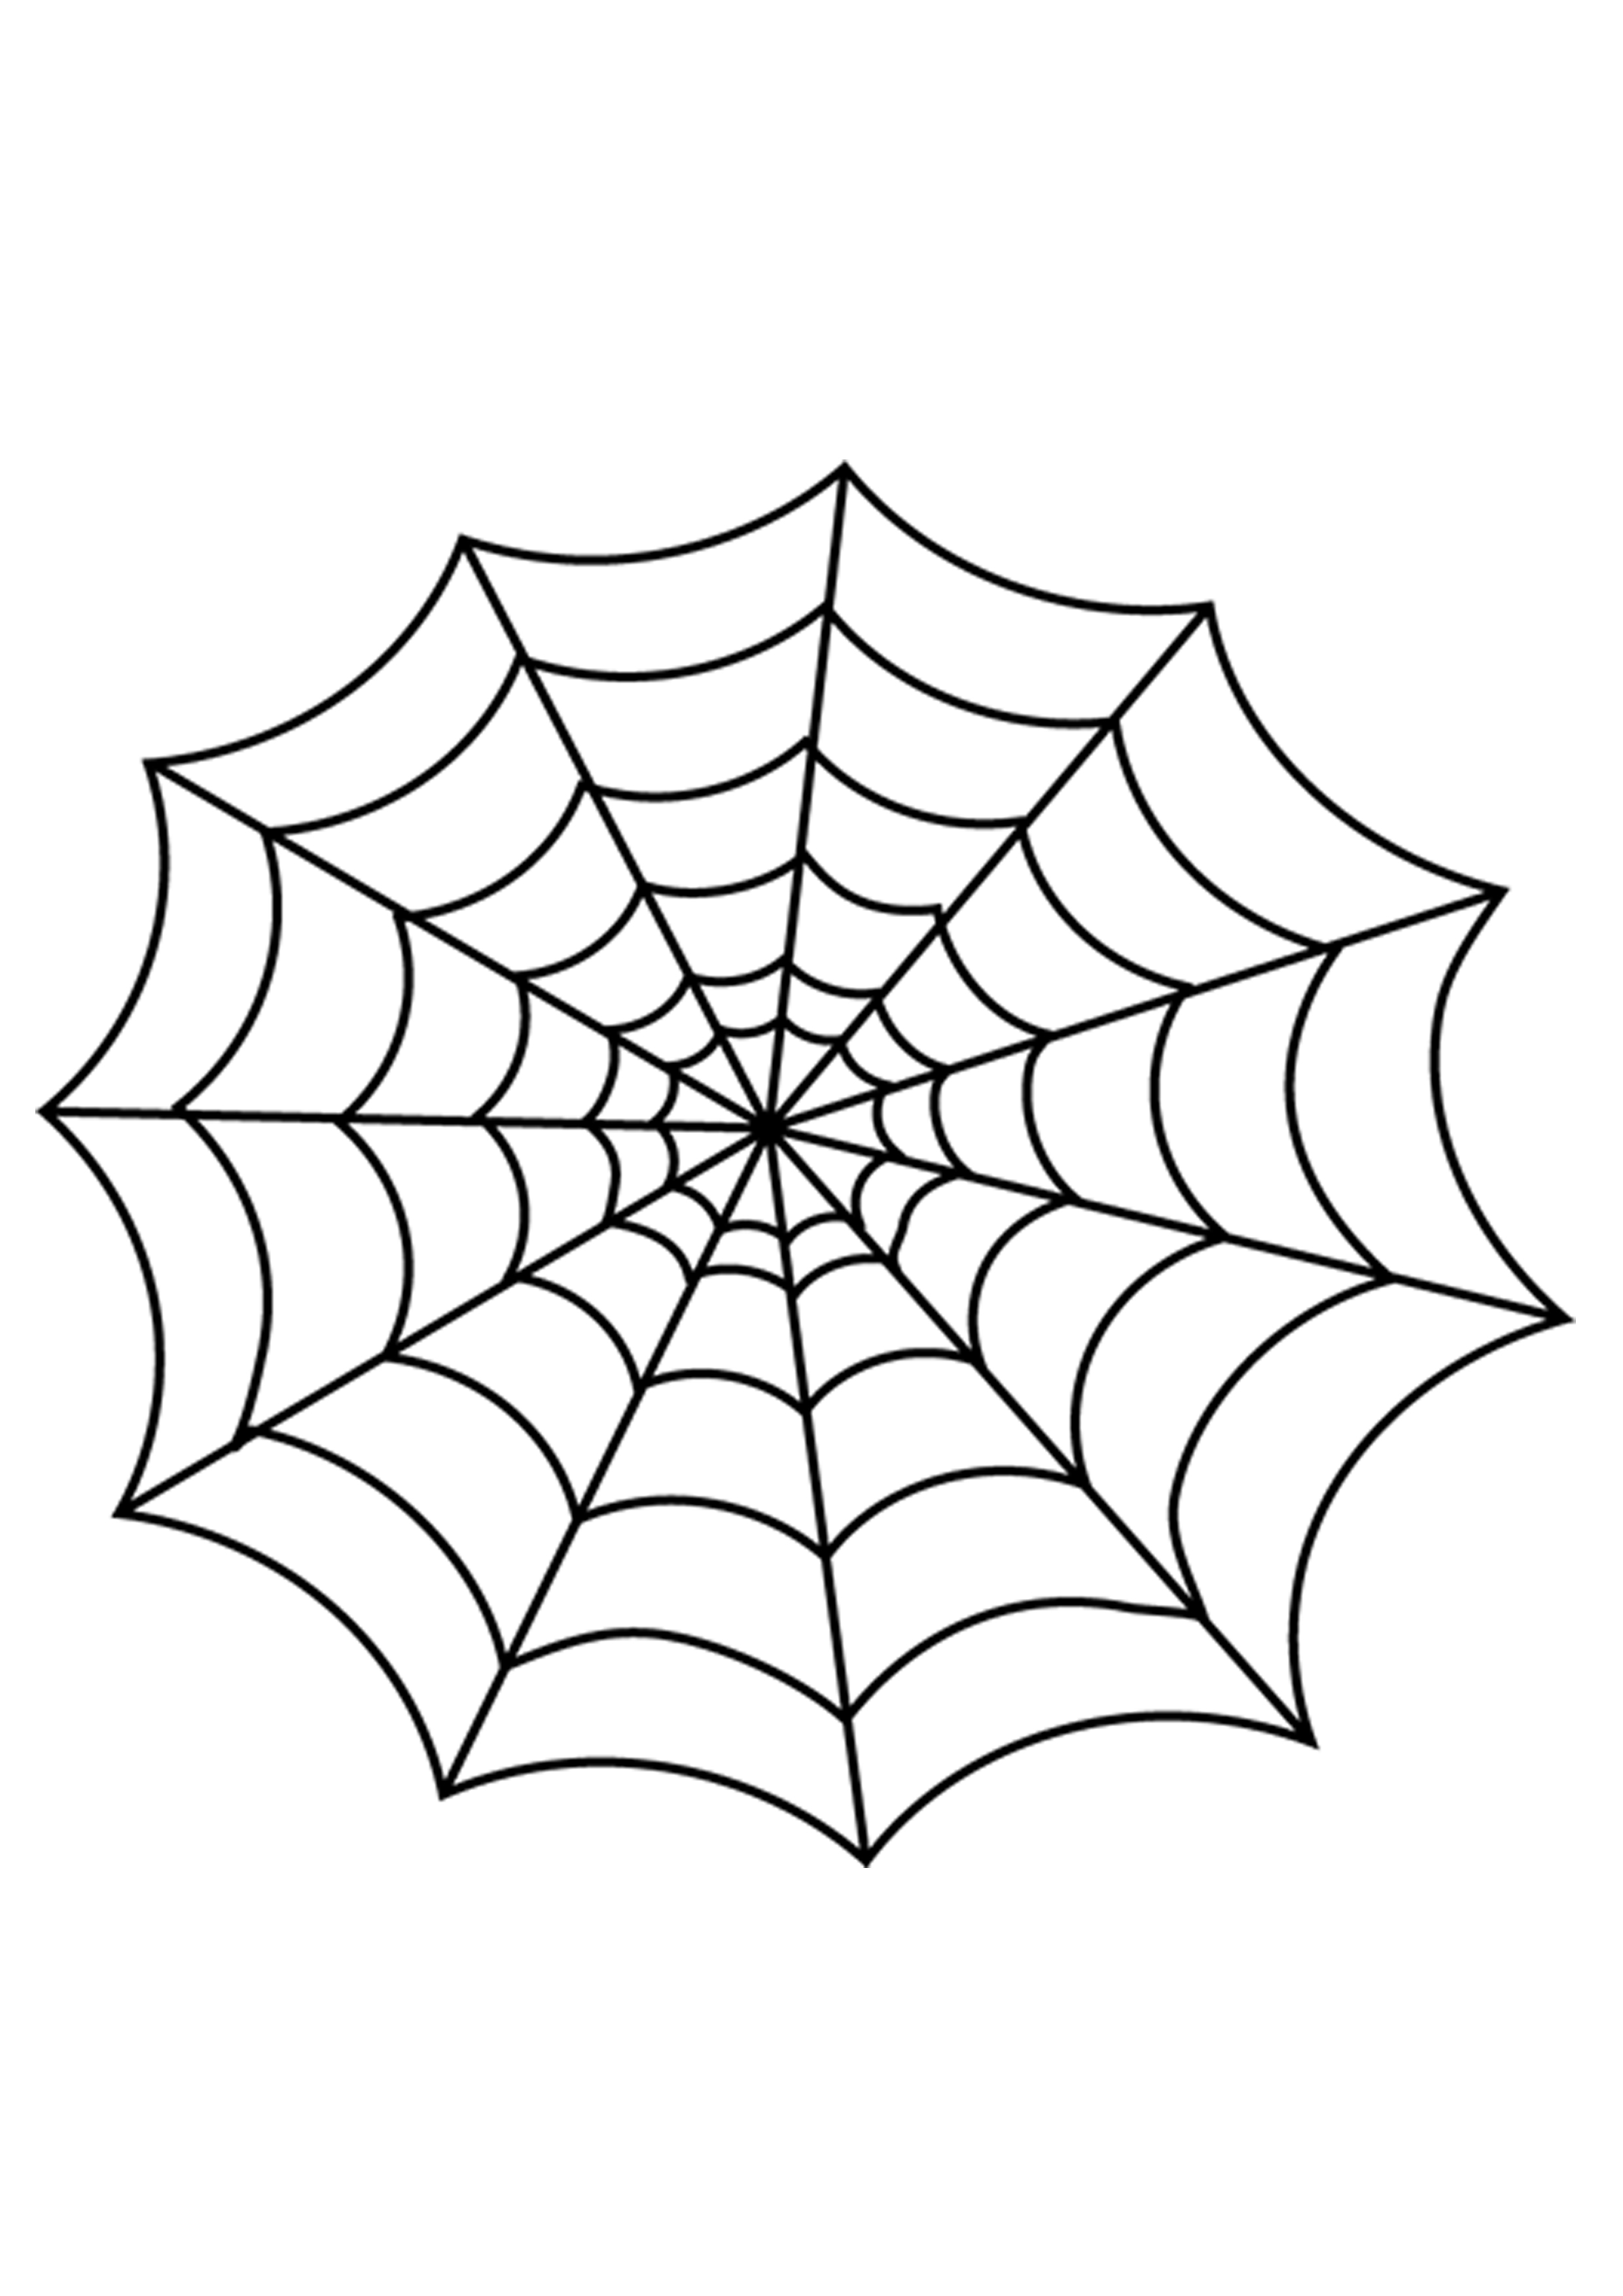 2480x3508 How To Make Glitter Glue Spider Web Halloween Decorations